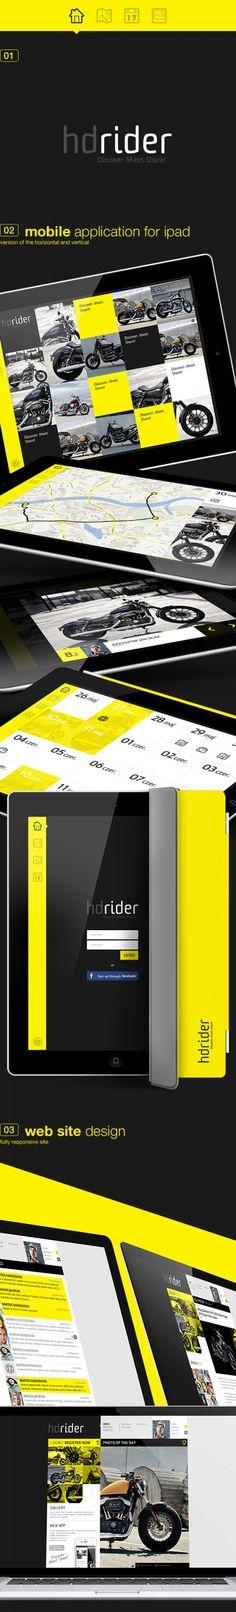 Webdesign inspiration  http://numerik.blogspirit.com/design-mobile-inspiration-4.html